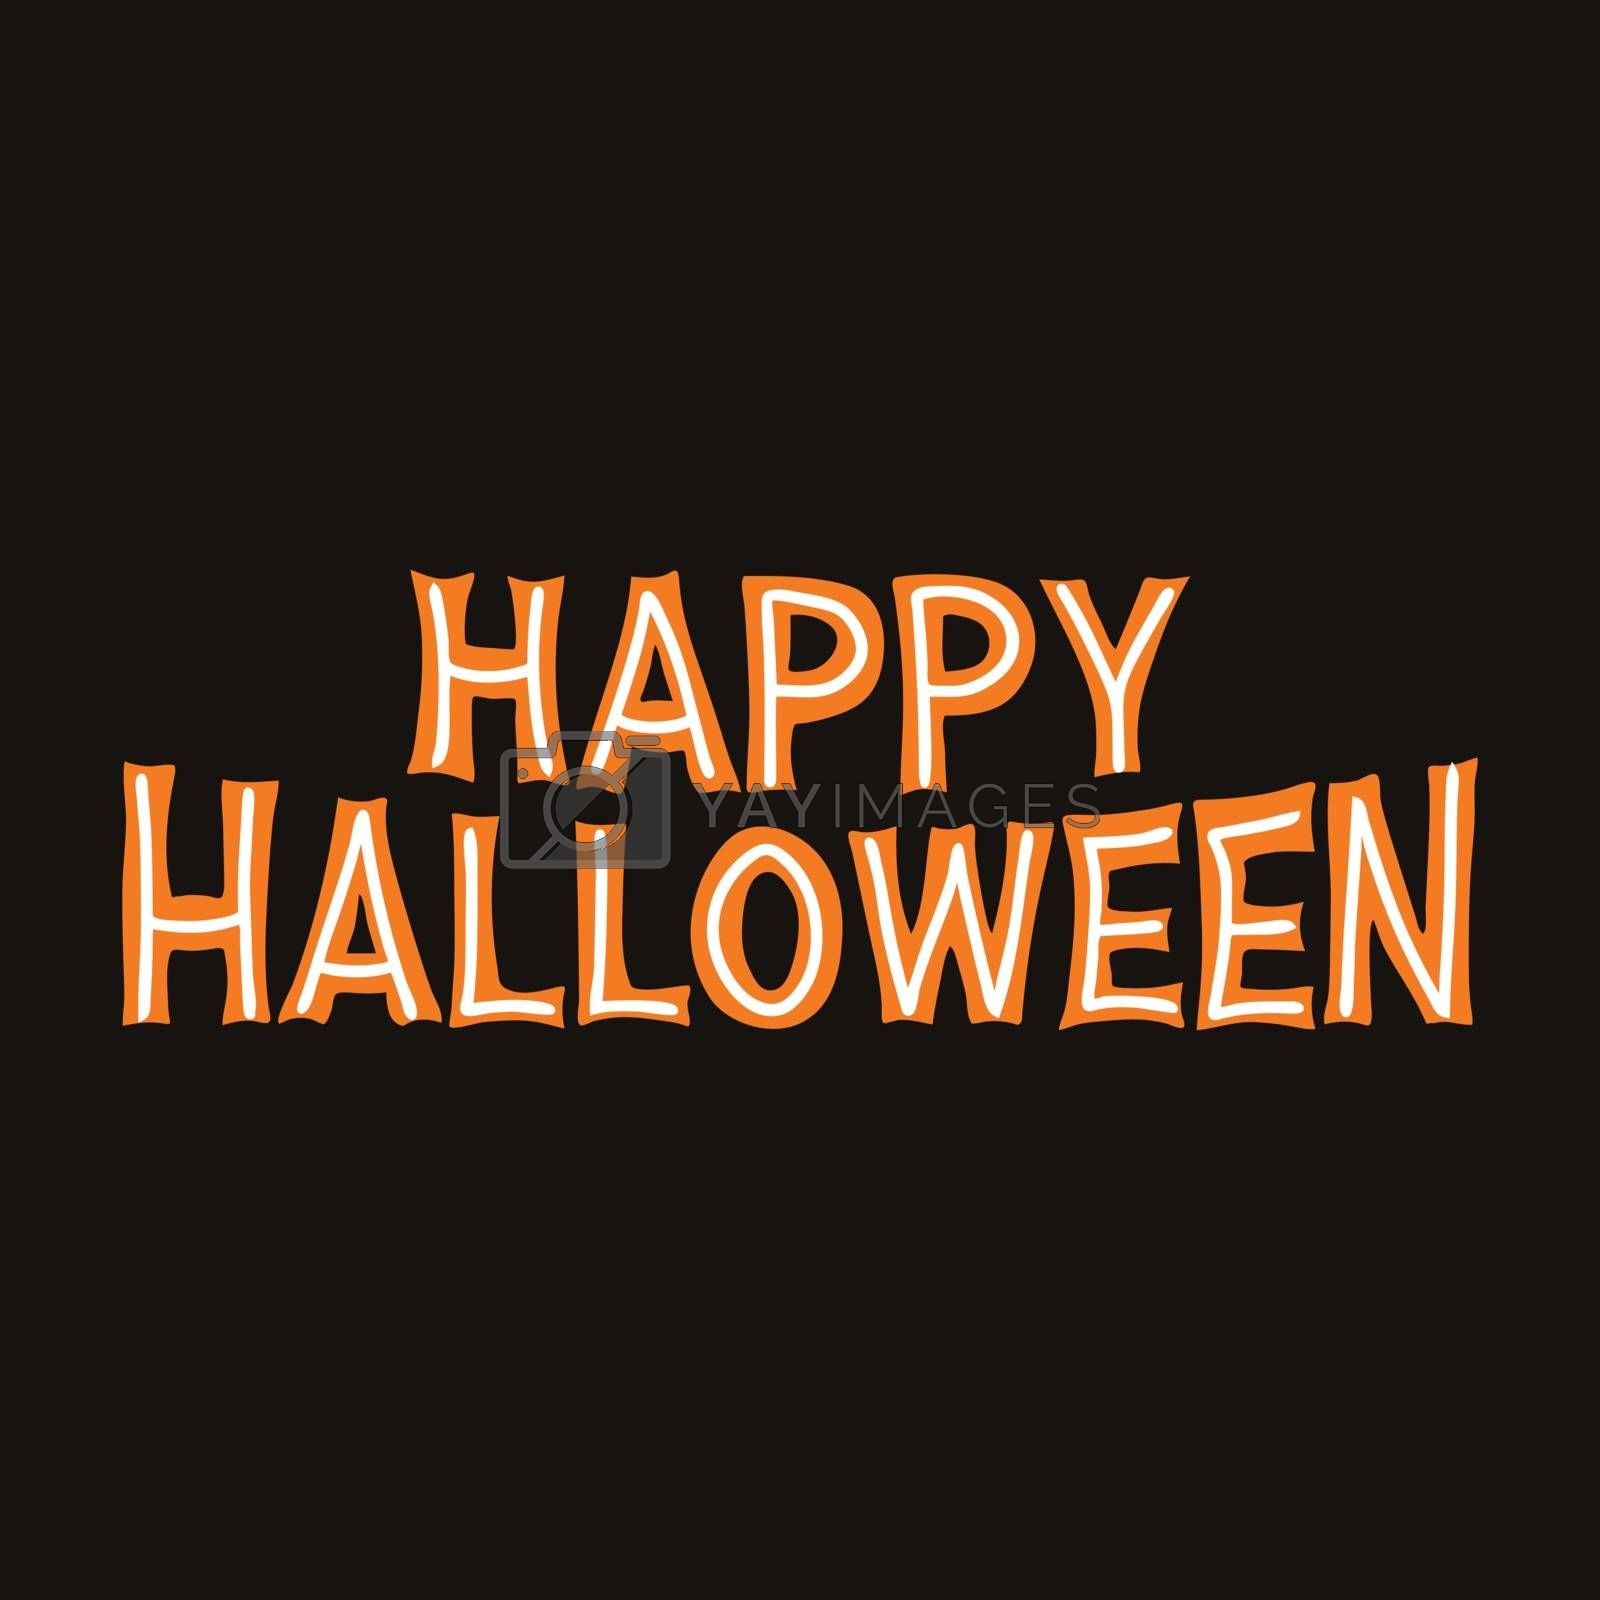 Happy Halloween. Orange lettering with white lines on dark background. Vector stock illustration.